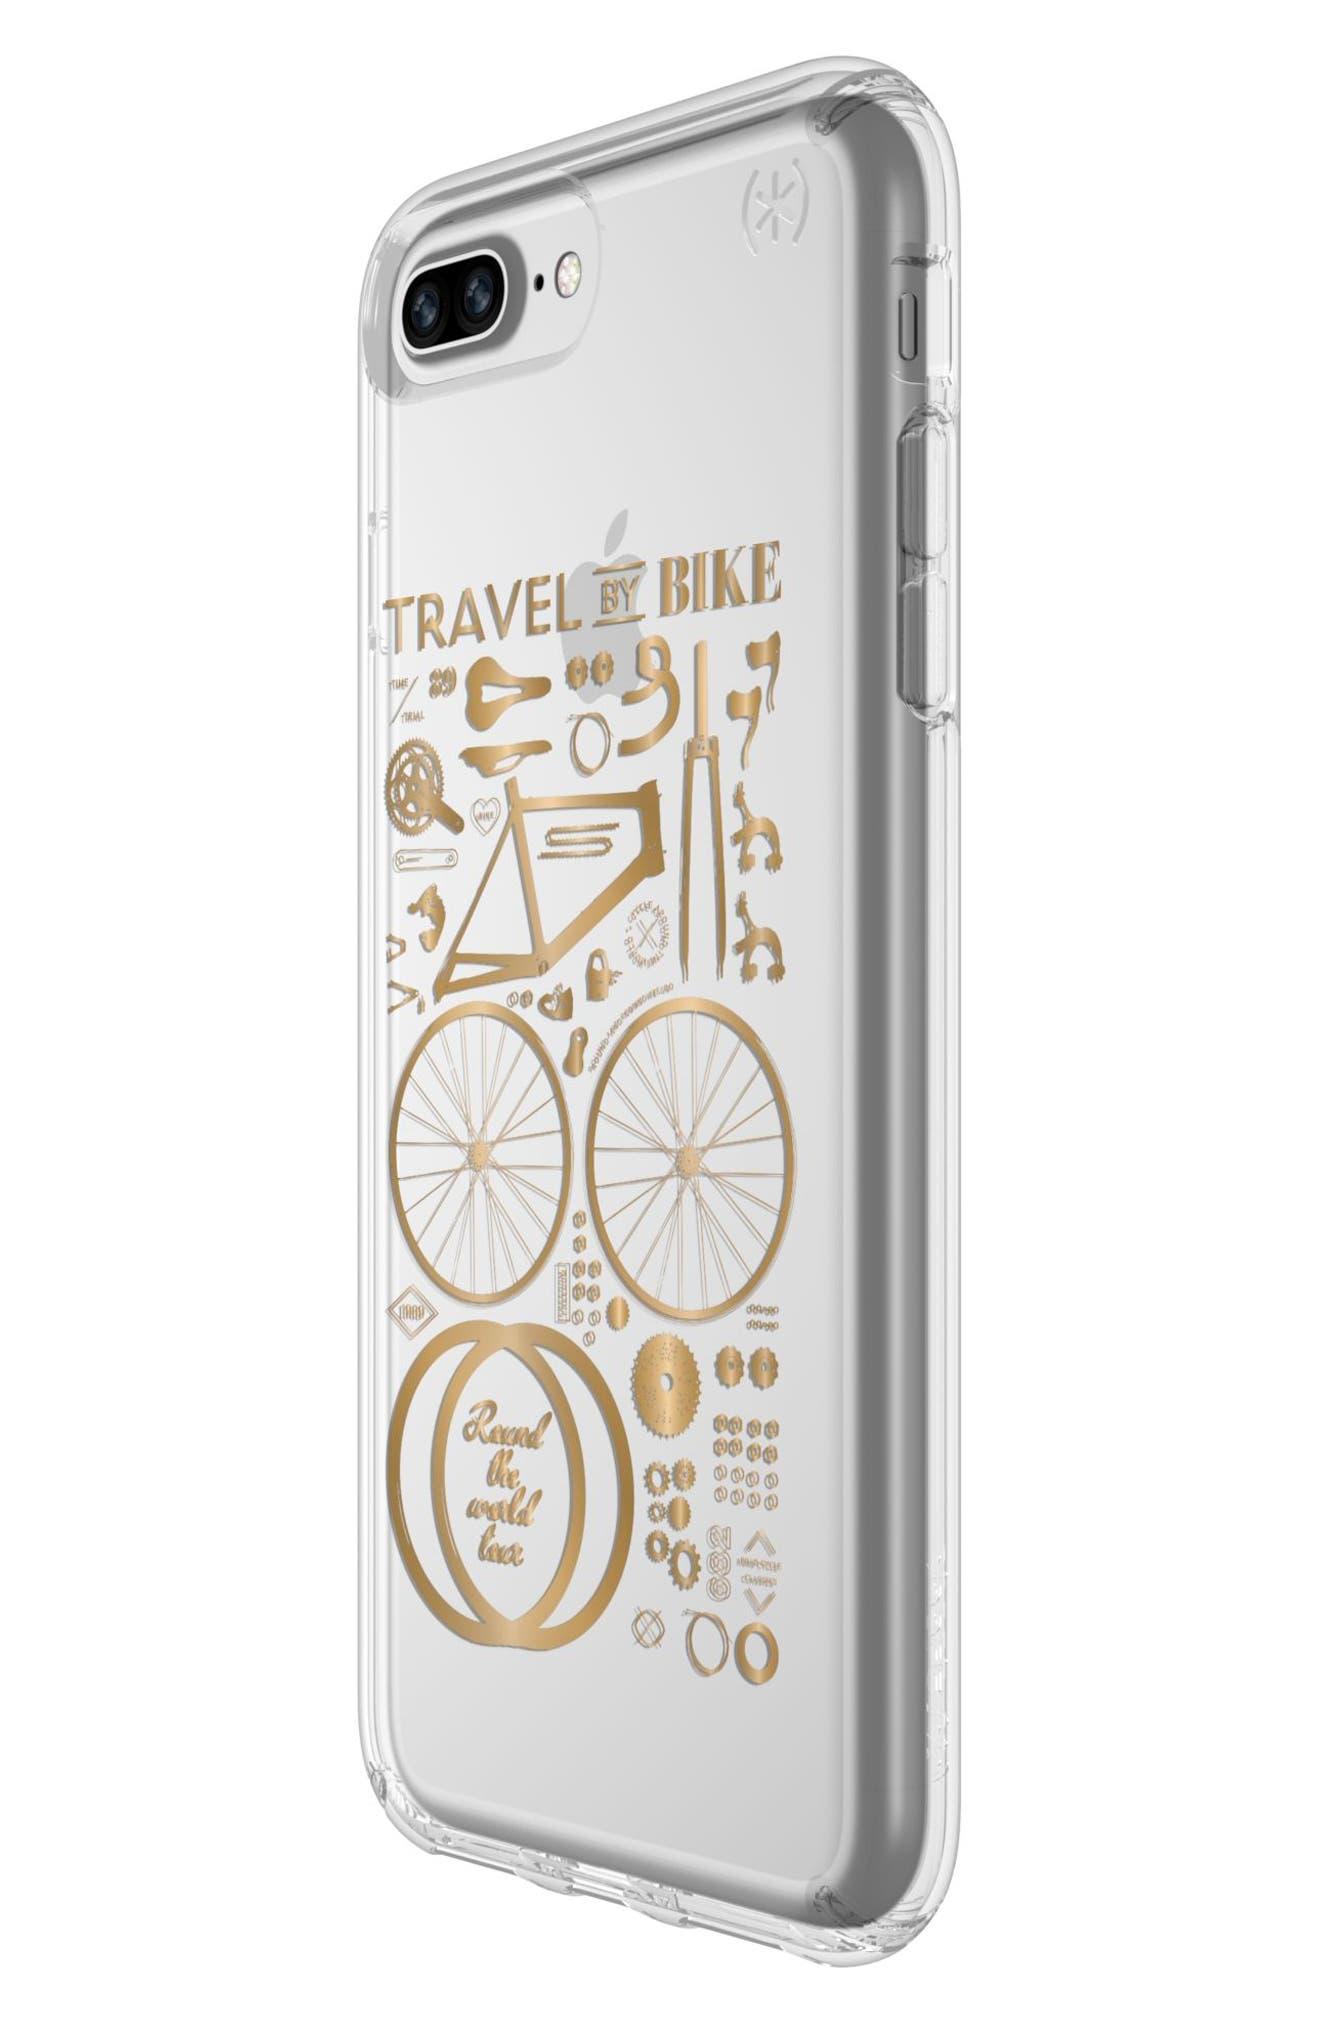 iPhone 6 Plus/6S Plus/7 Plus/8 Plus Case,                             Alternate thumbnail 3, color,                             Citybike Metallic Gold/ Clear